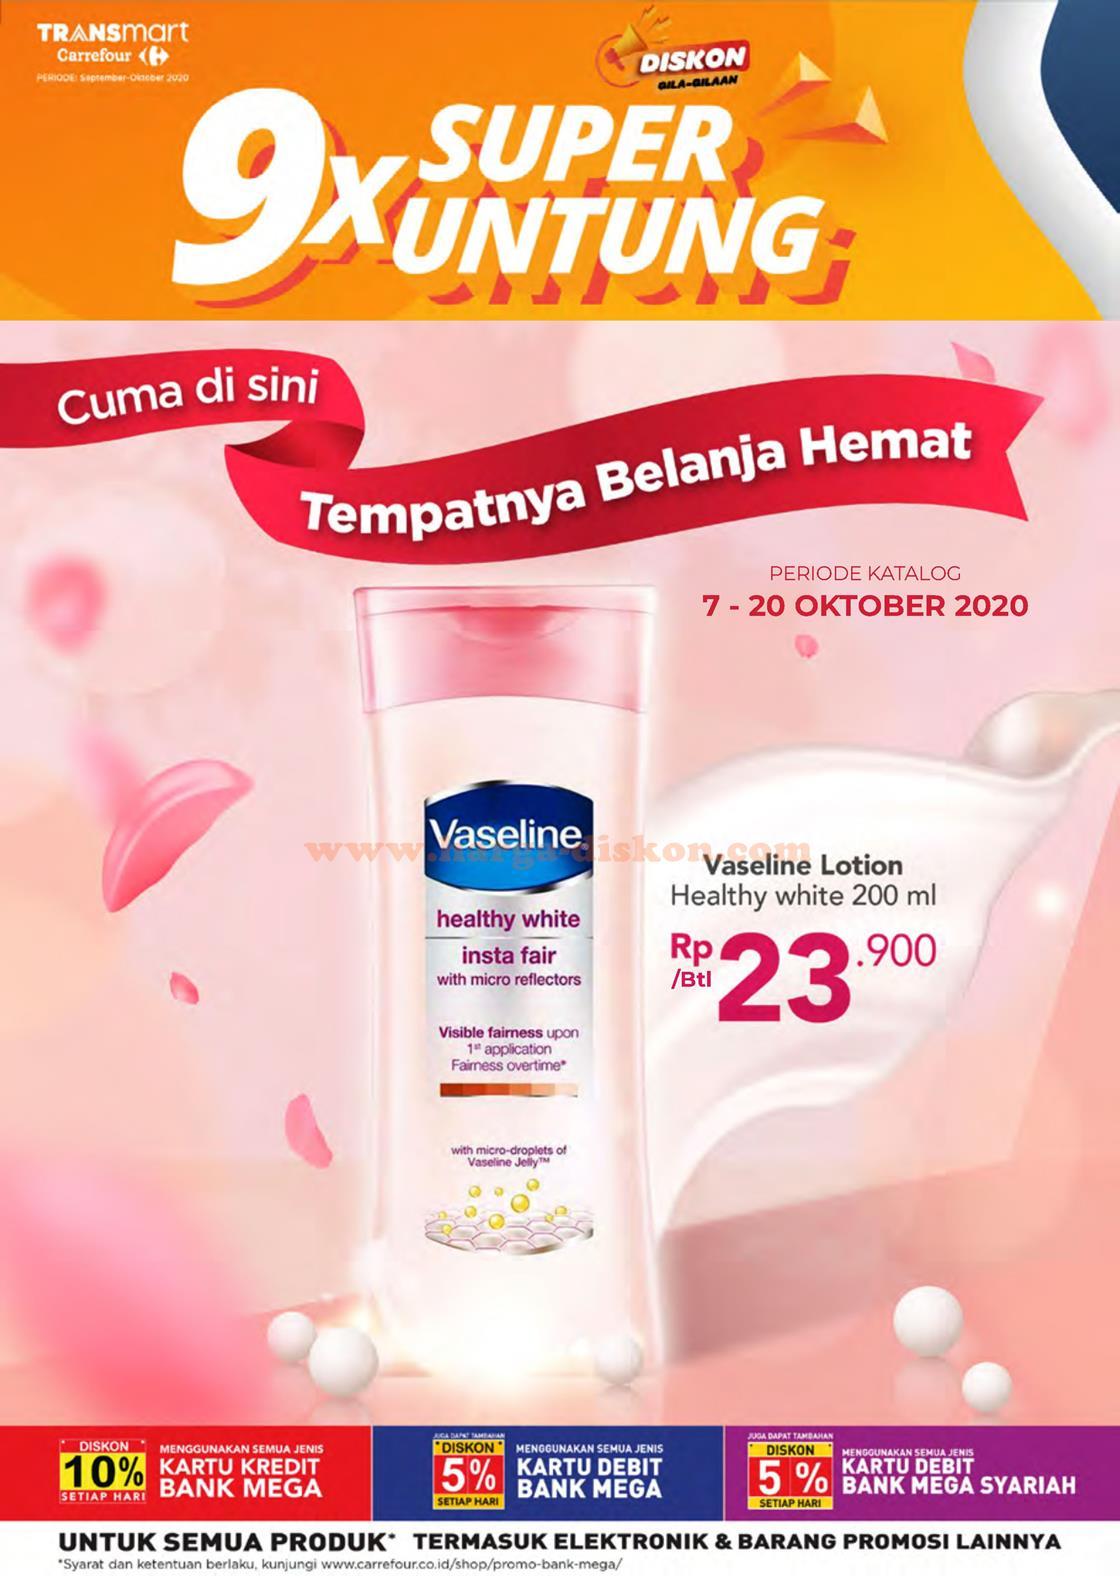 Katalog Promo Transmart Carrefour Terbaru 7 20 Oktober 2020 Harga Diskon